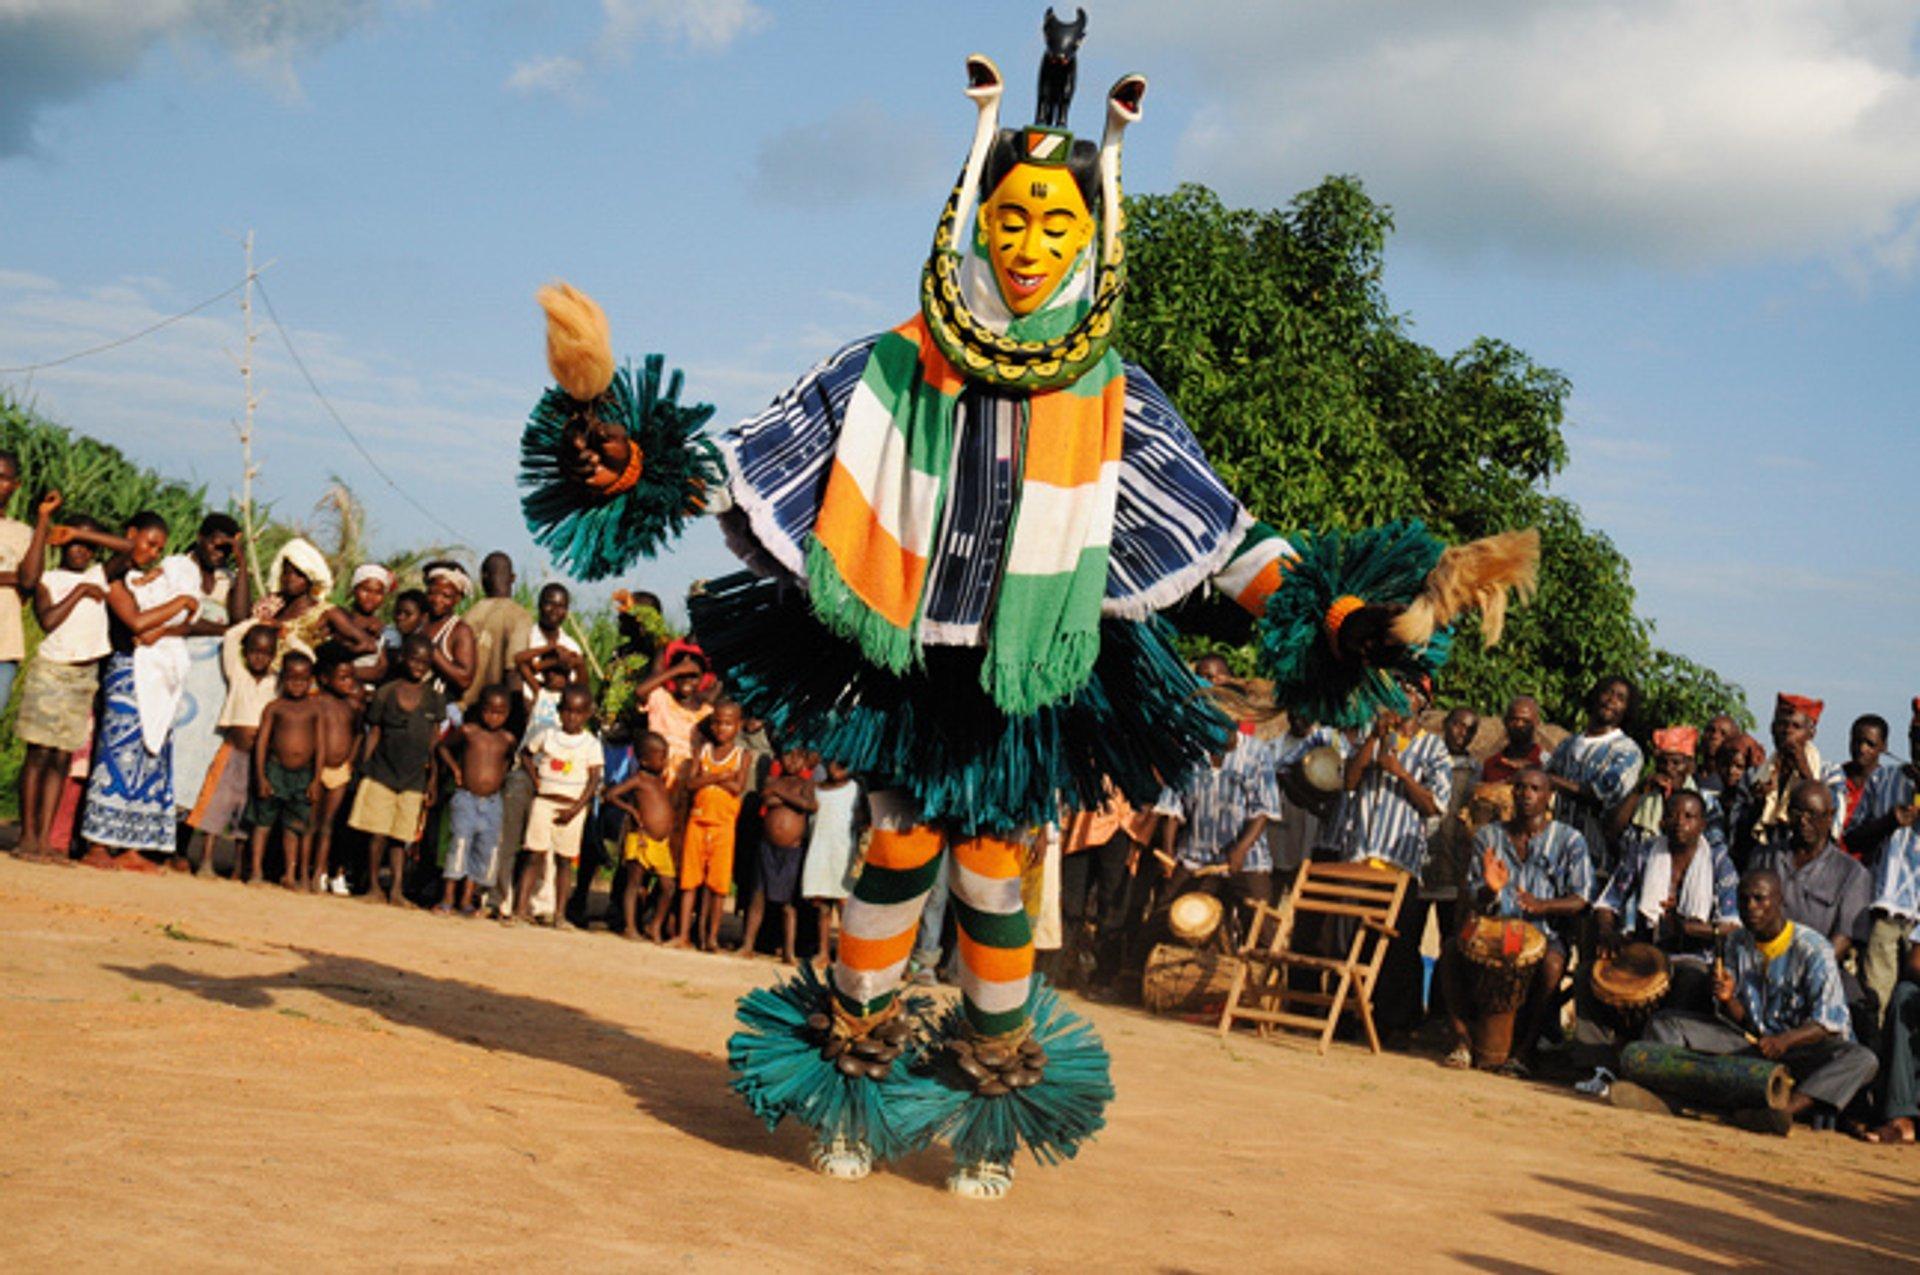 Zaouli Dance (Zaouli de Manfla) in Ivory Coast 2020 - Best Time